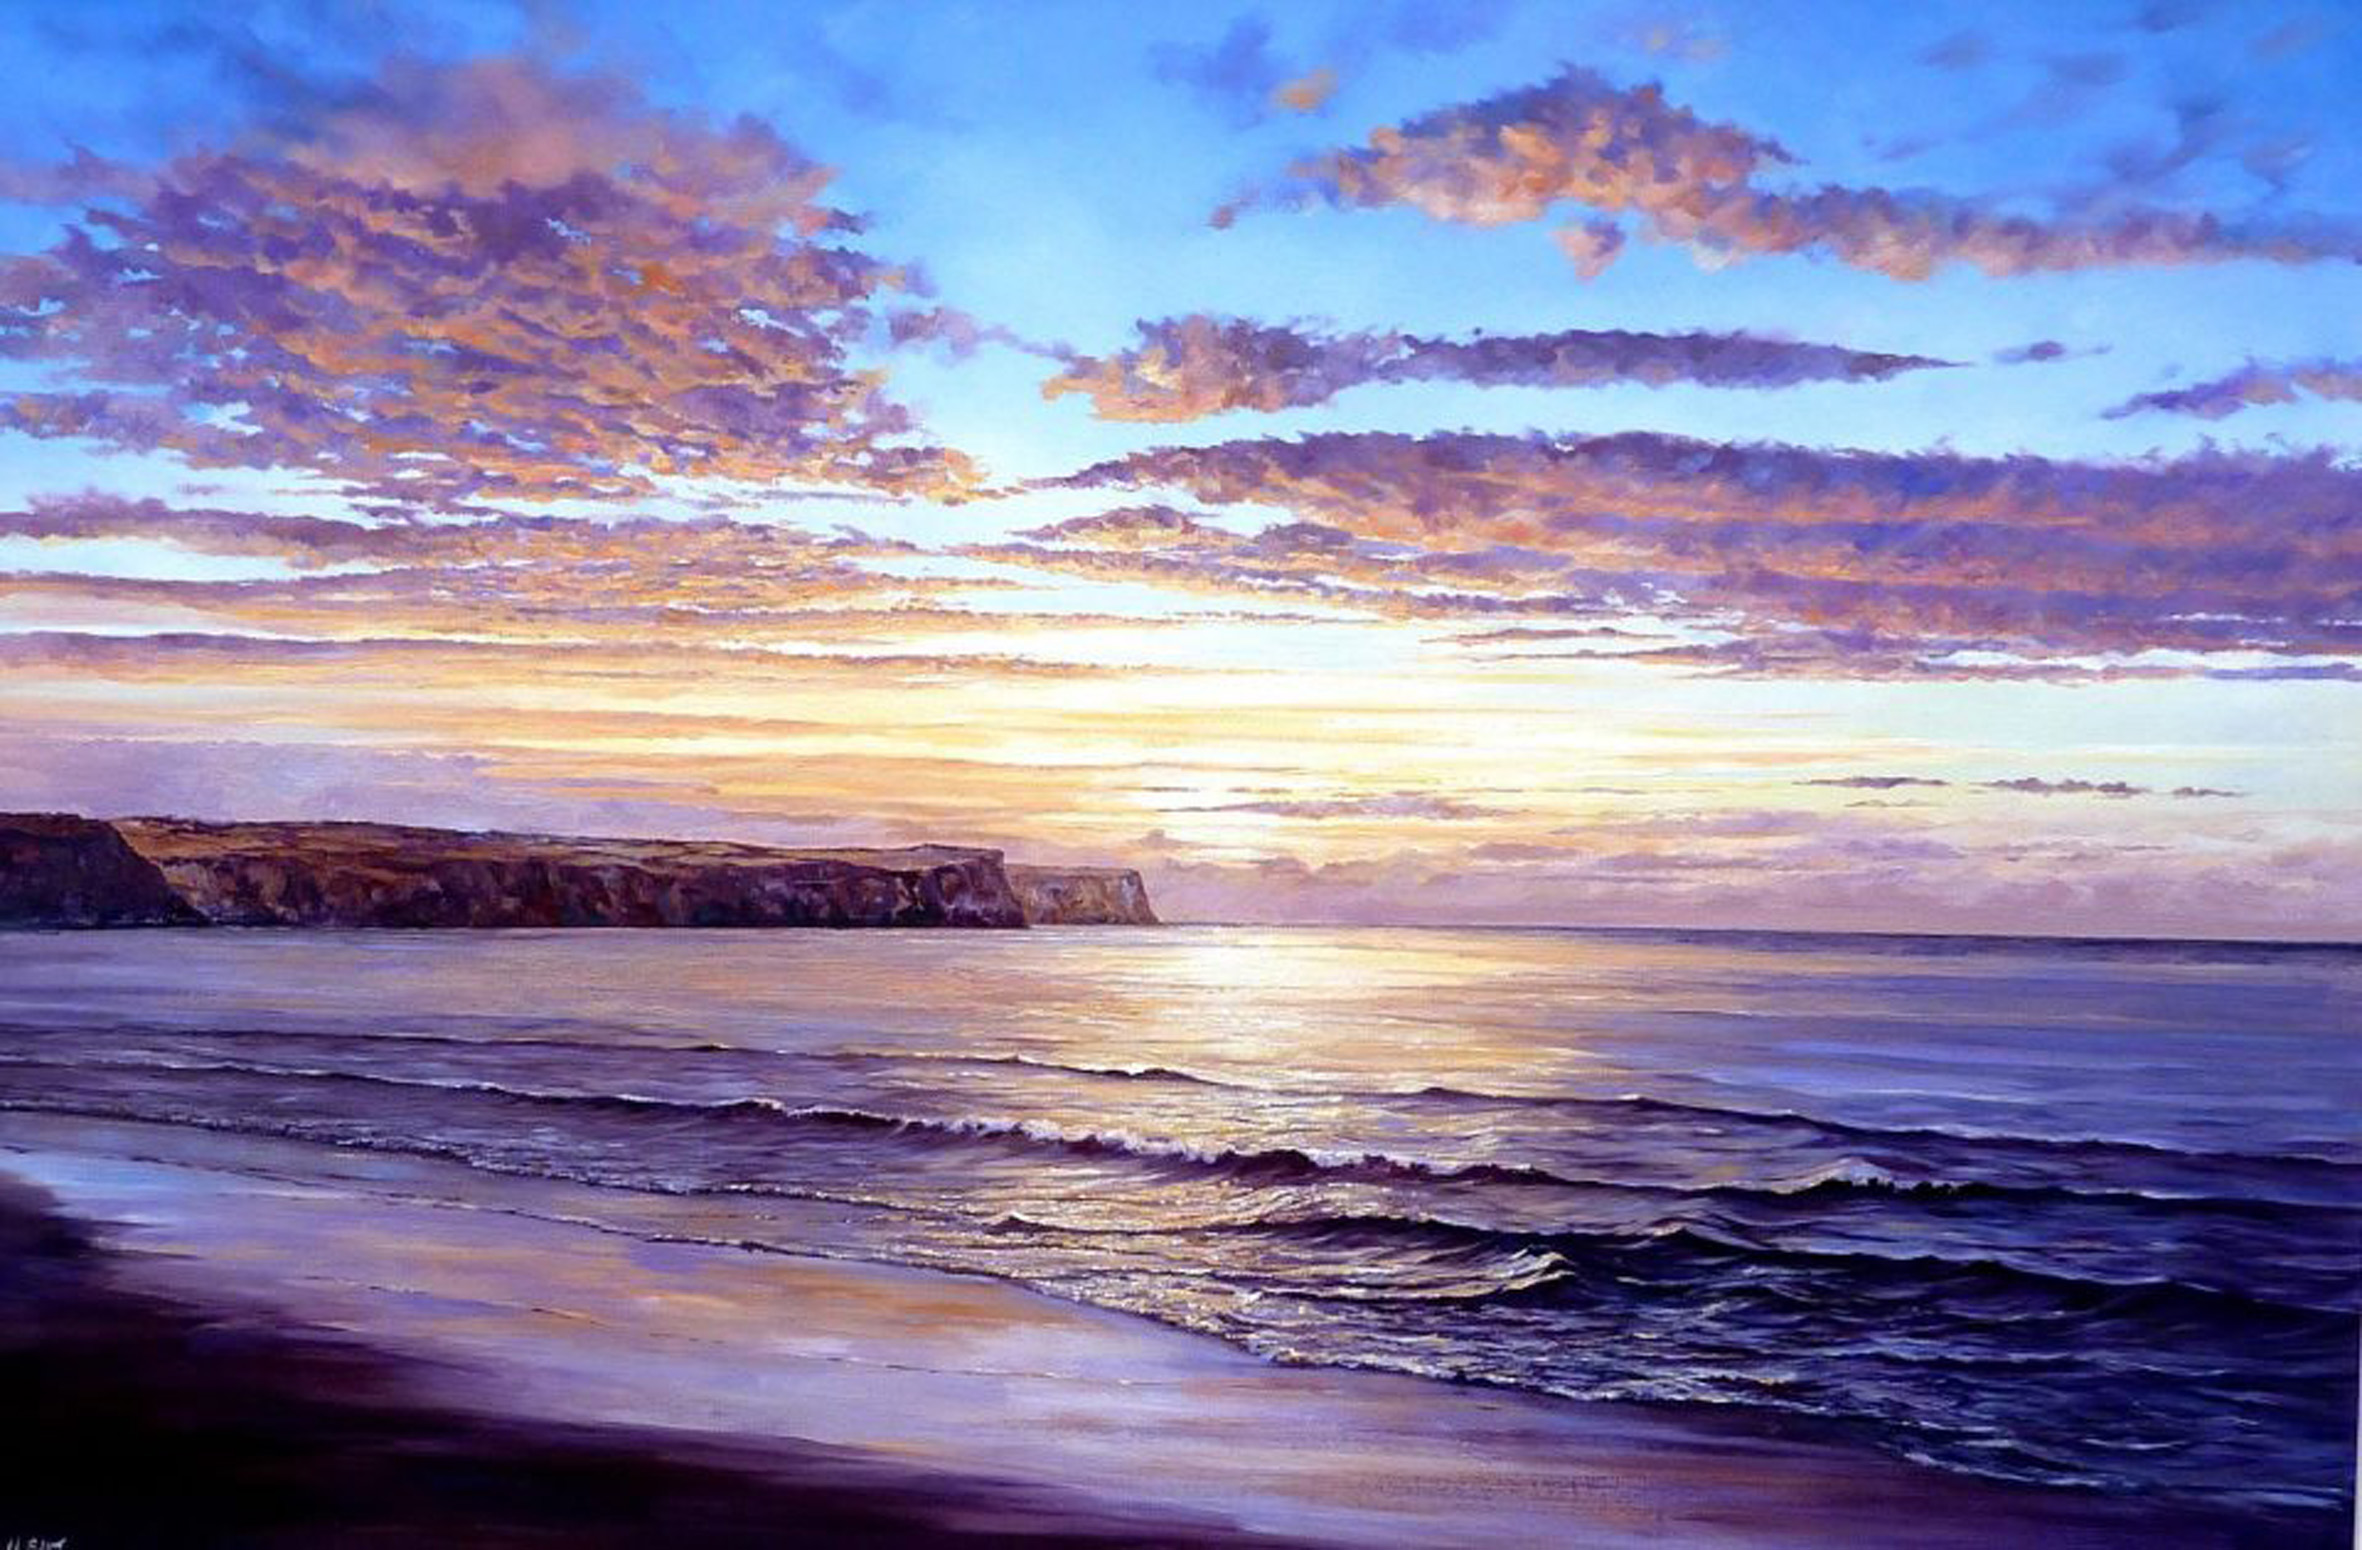 Sandsend_Sunset,90cm_x_60cm,£250.jpg